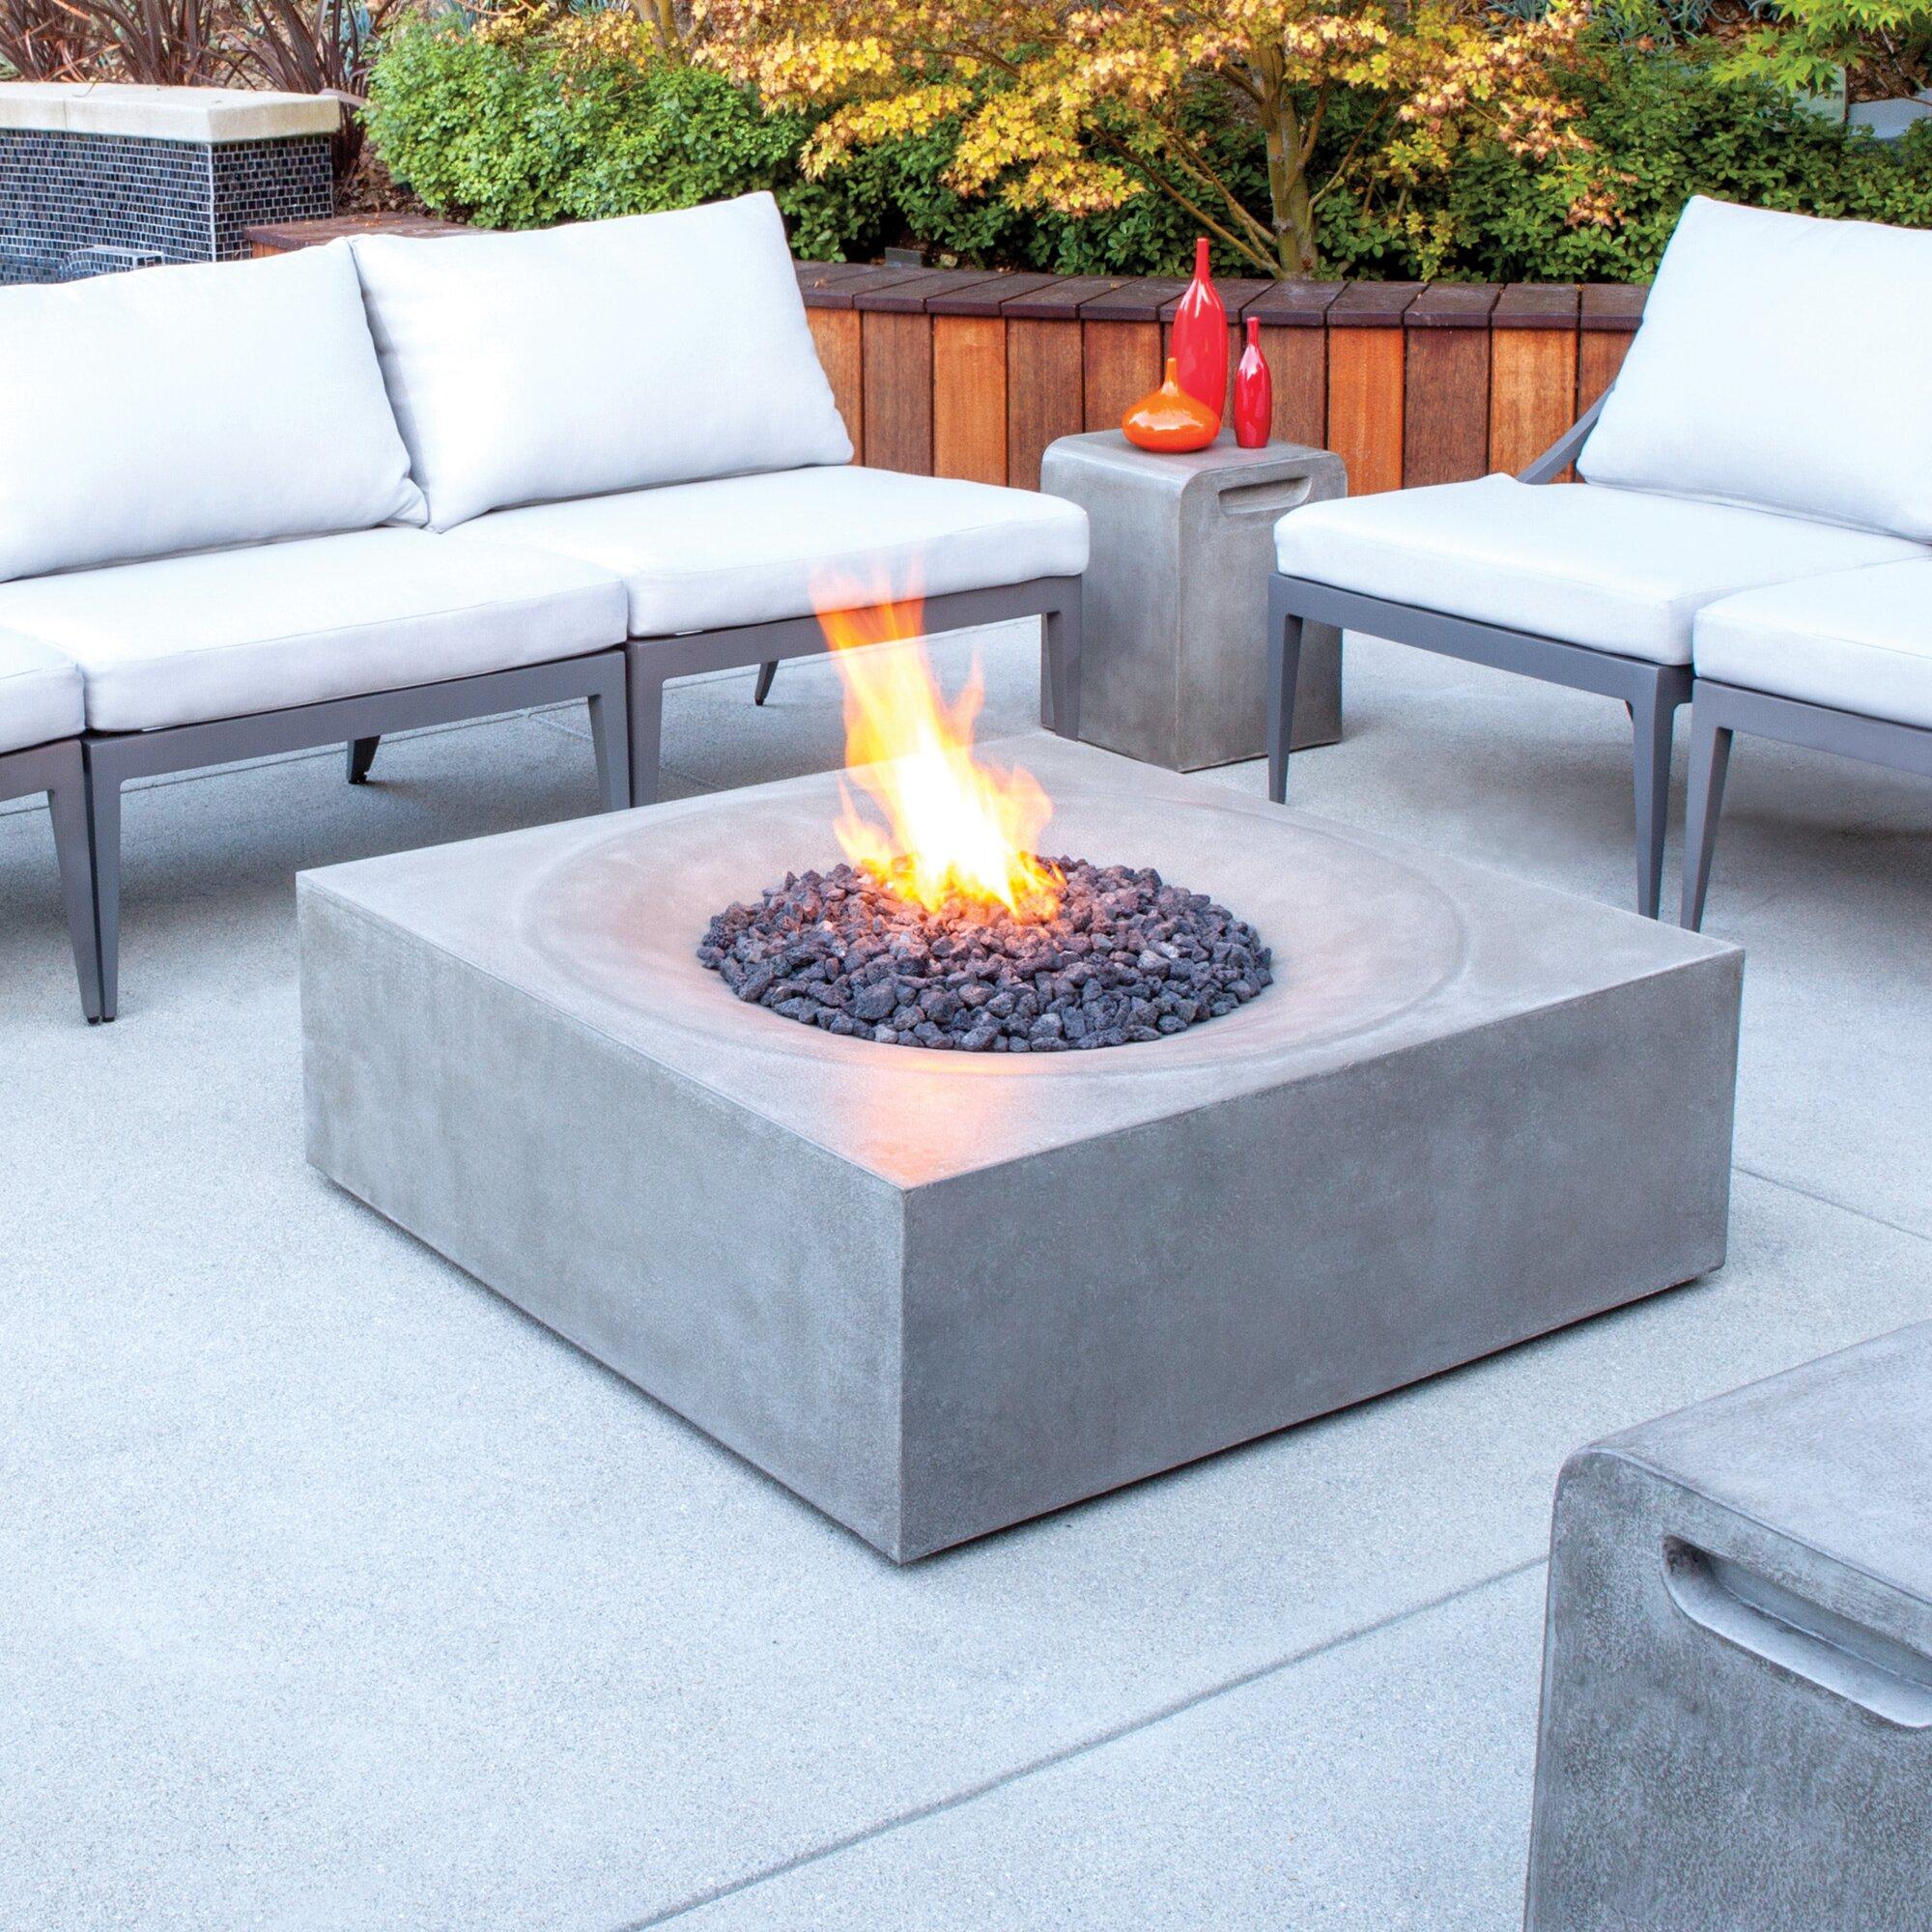 bjfs solstice concrete natural gas propane fire pit table reviews. Black Bedroom Furniture Sets. Home Design Ideas